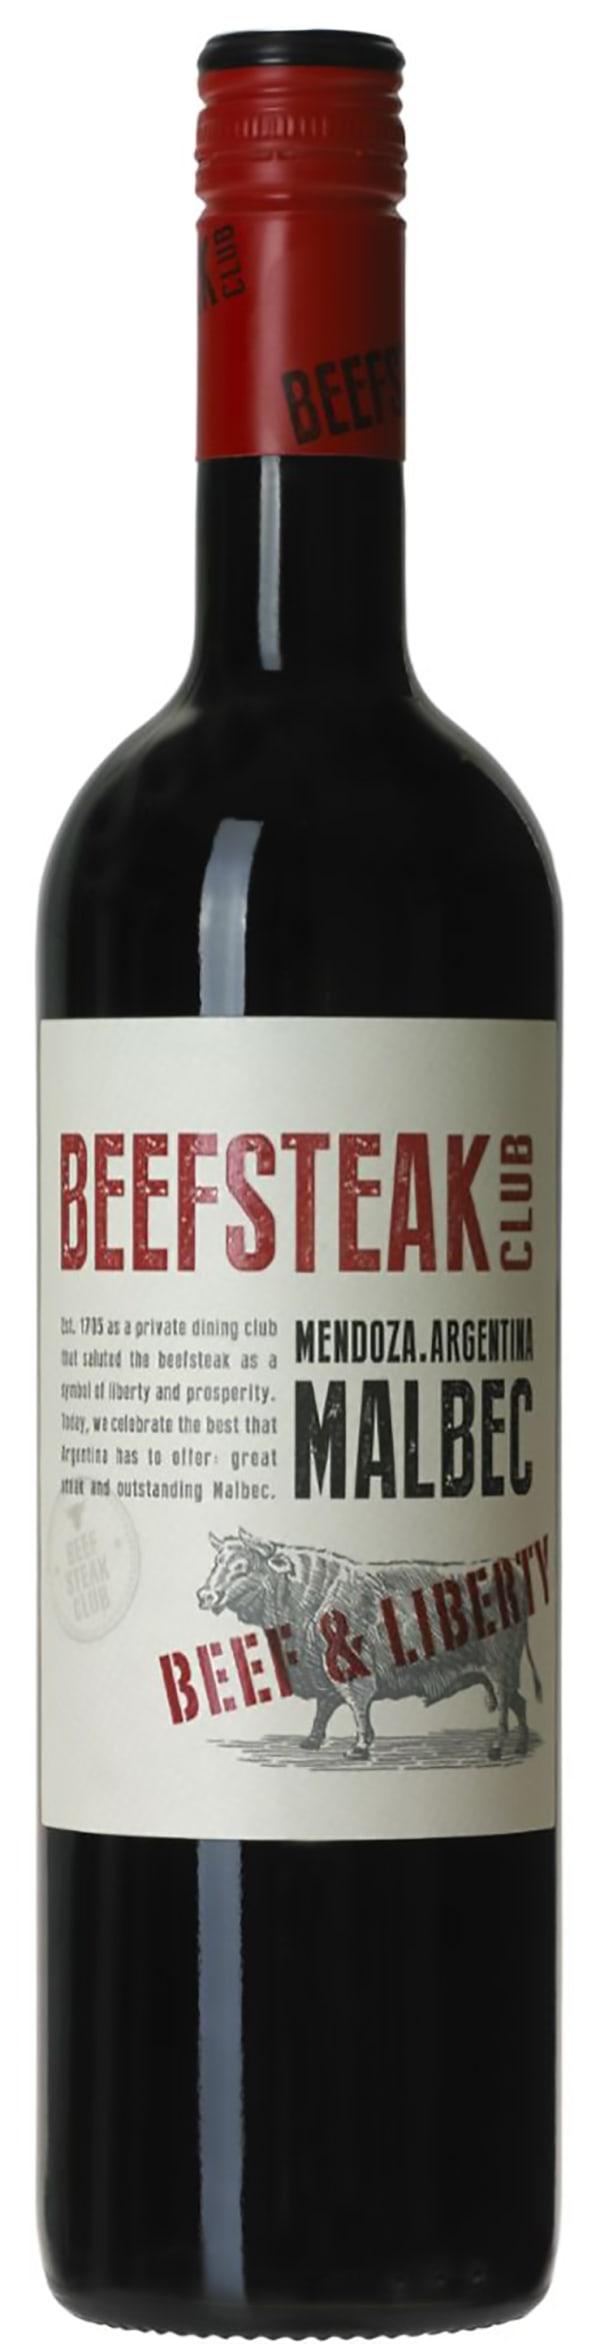 Beefsteak Club Malbec 2019